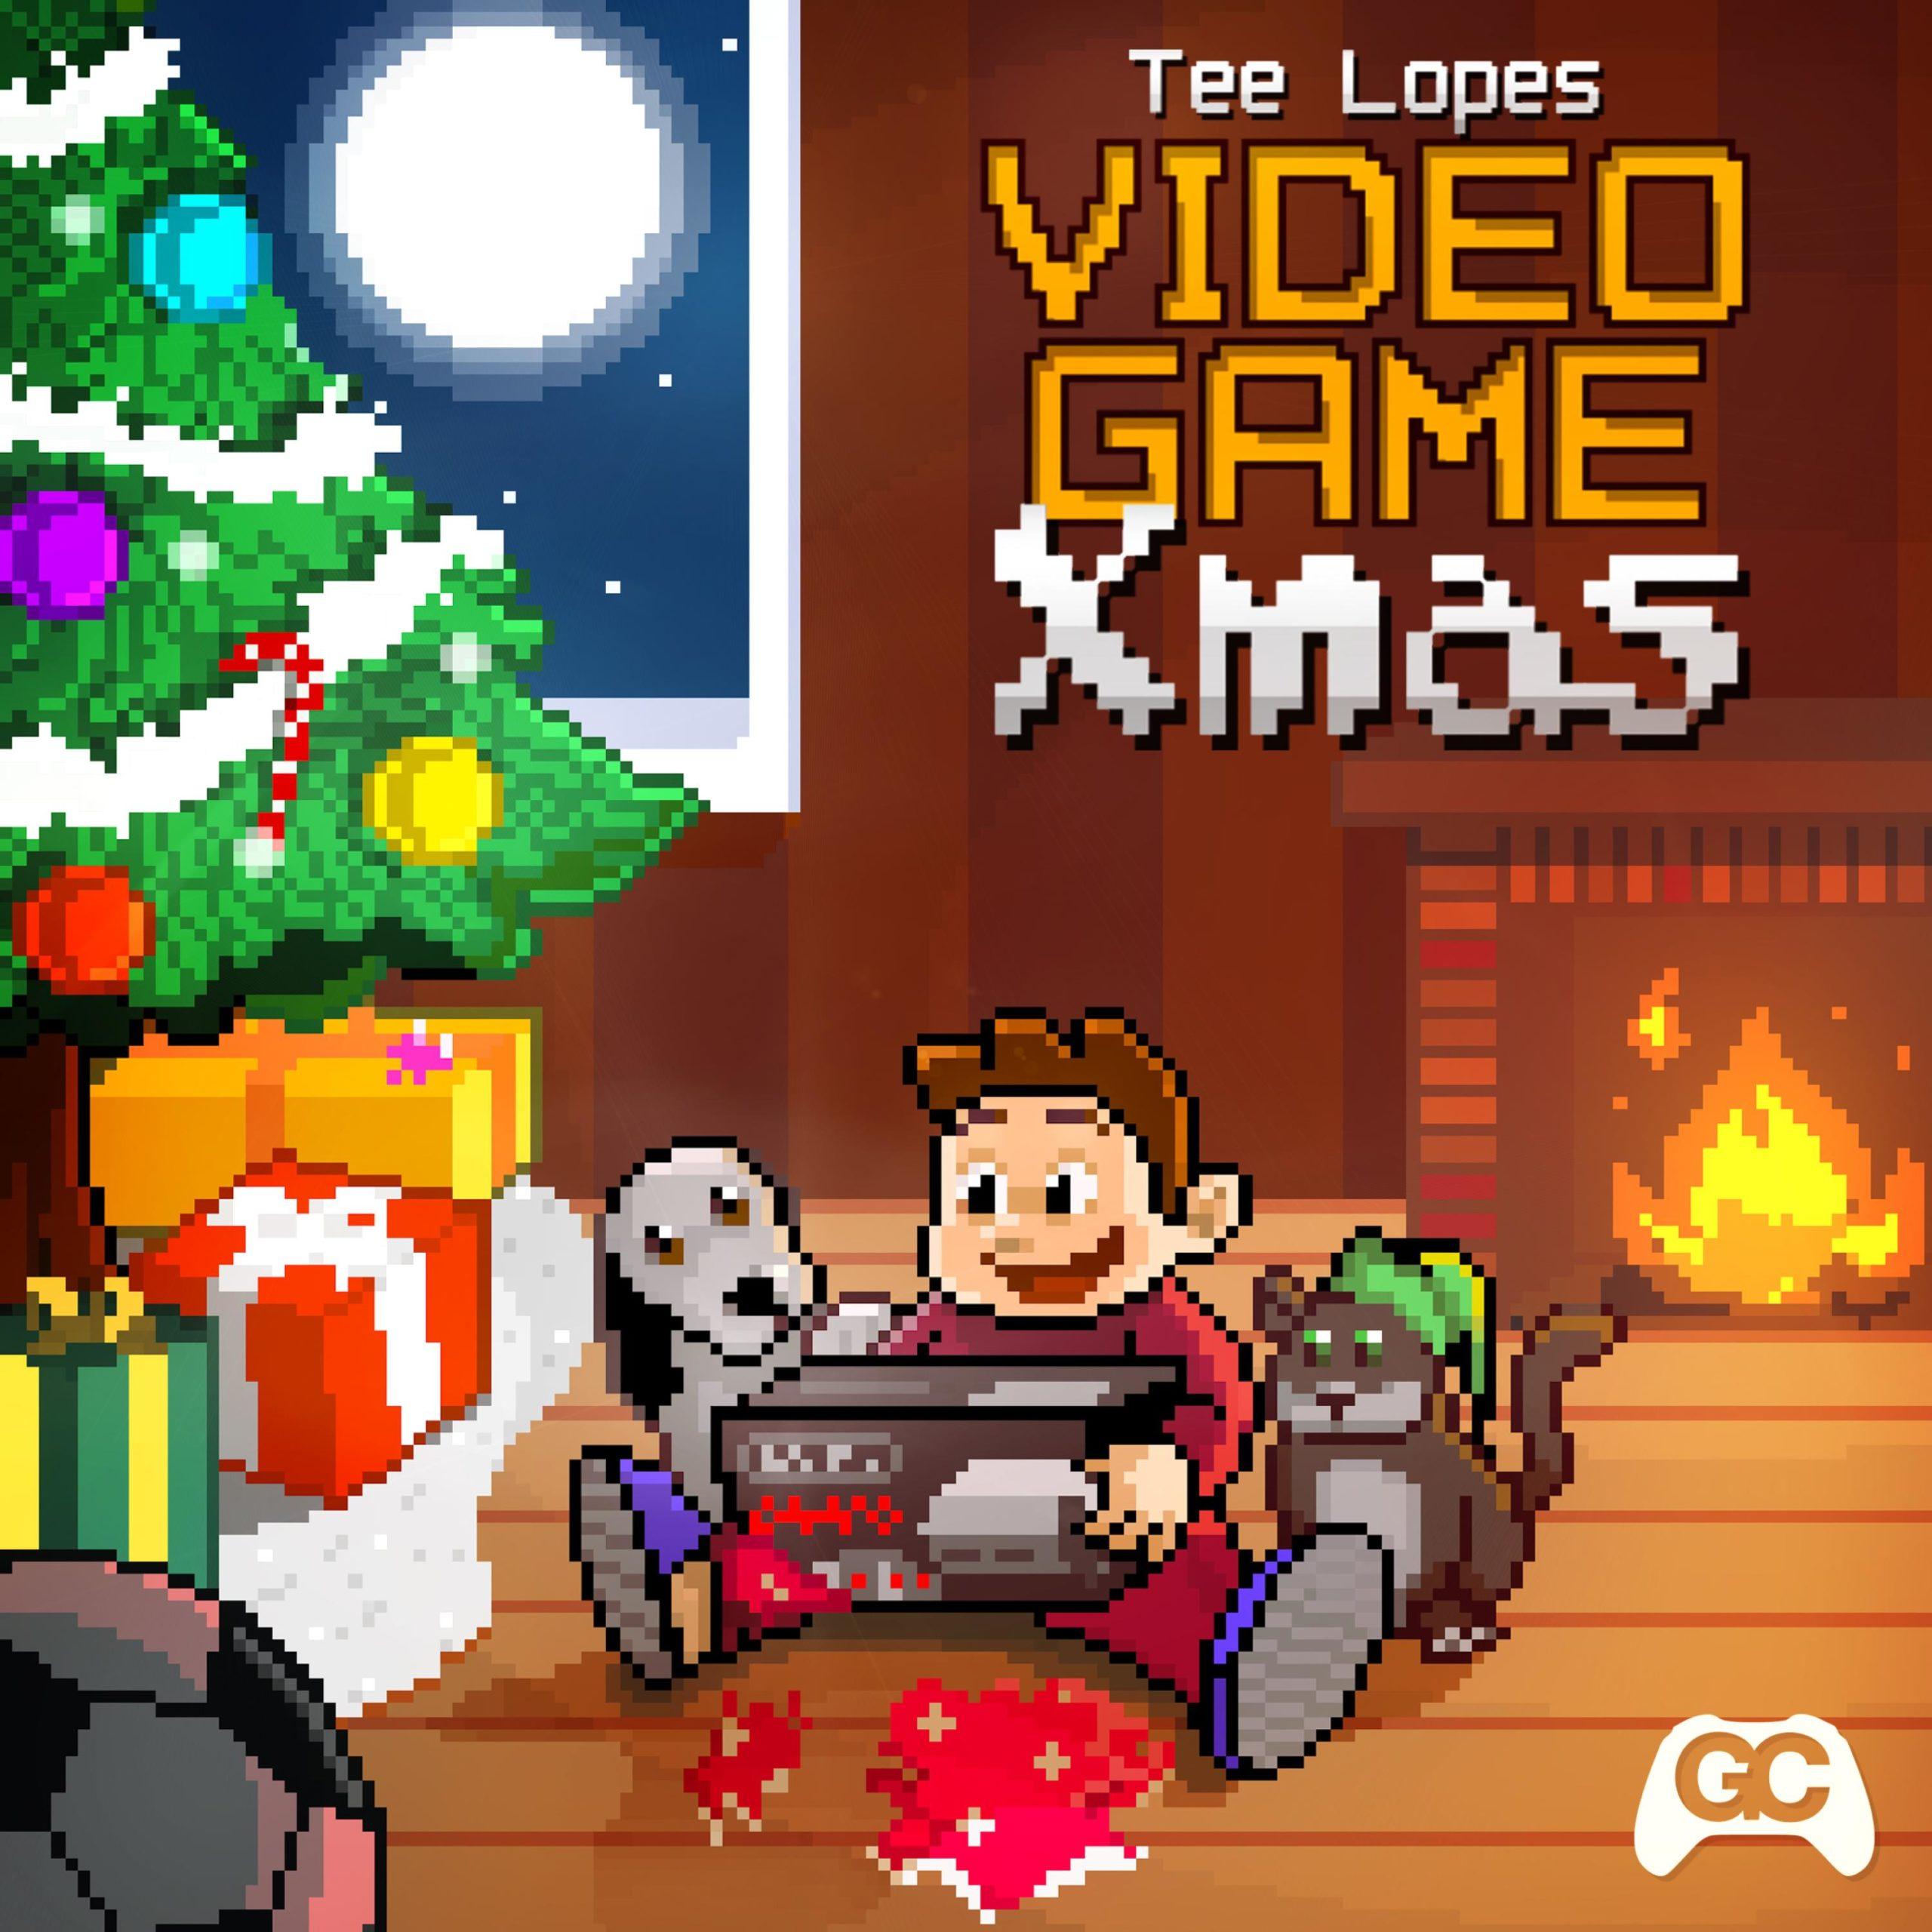 Video Game Xmas – Tee Lopes